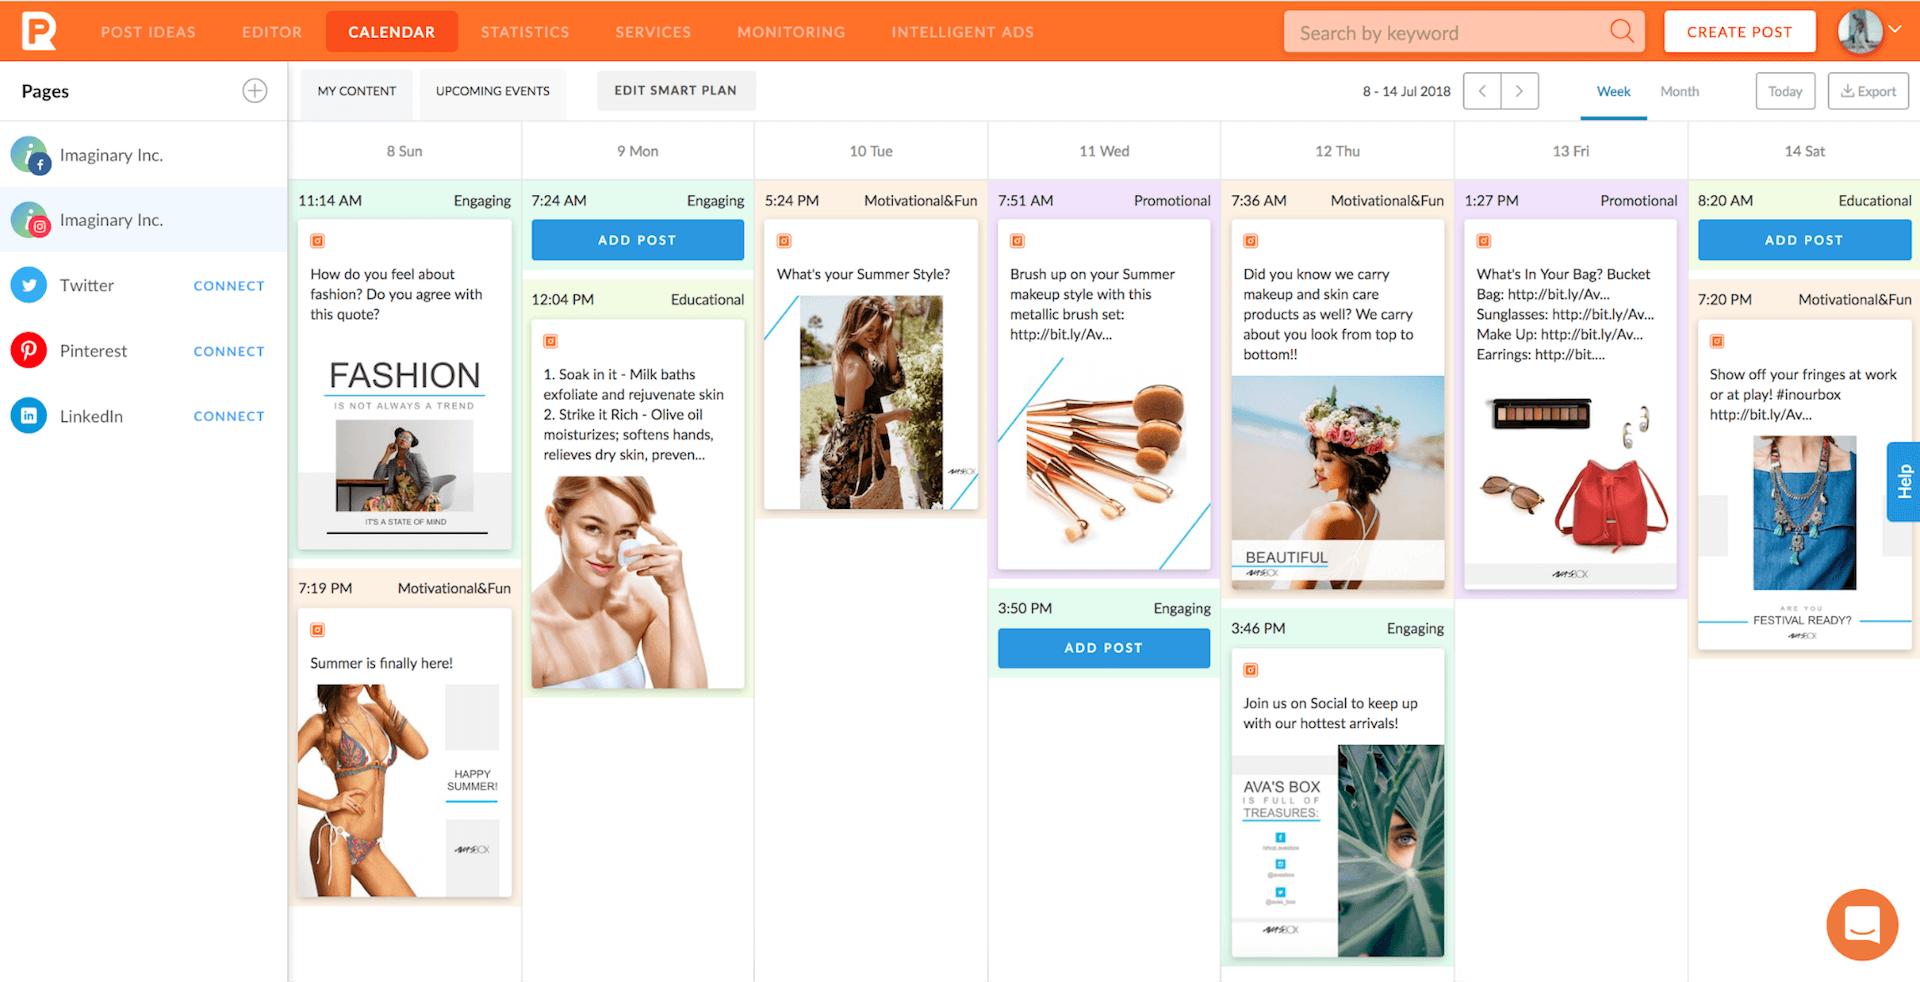 content plan overview in smart calendar